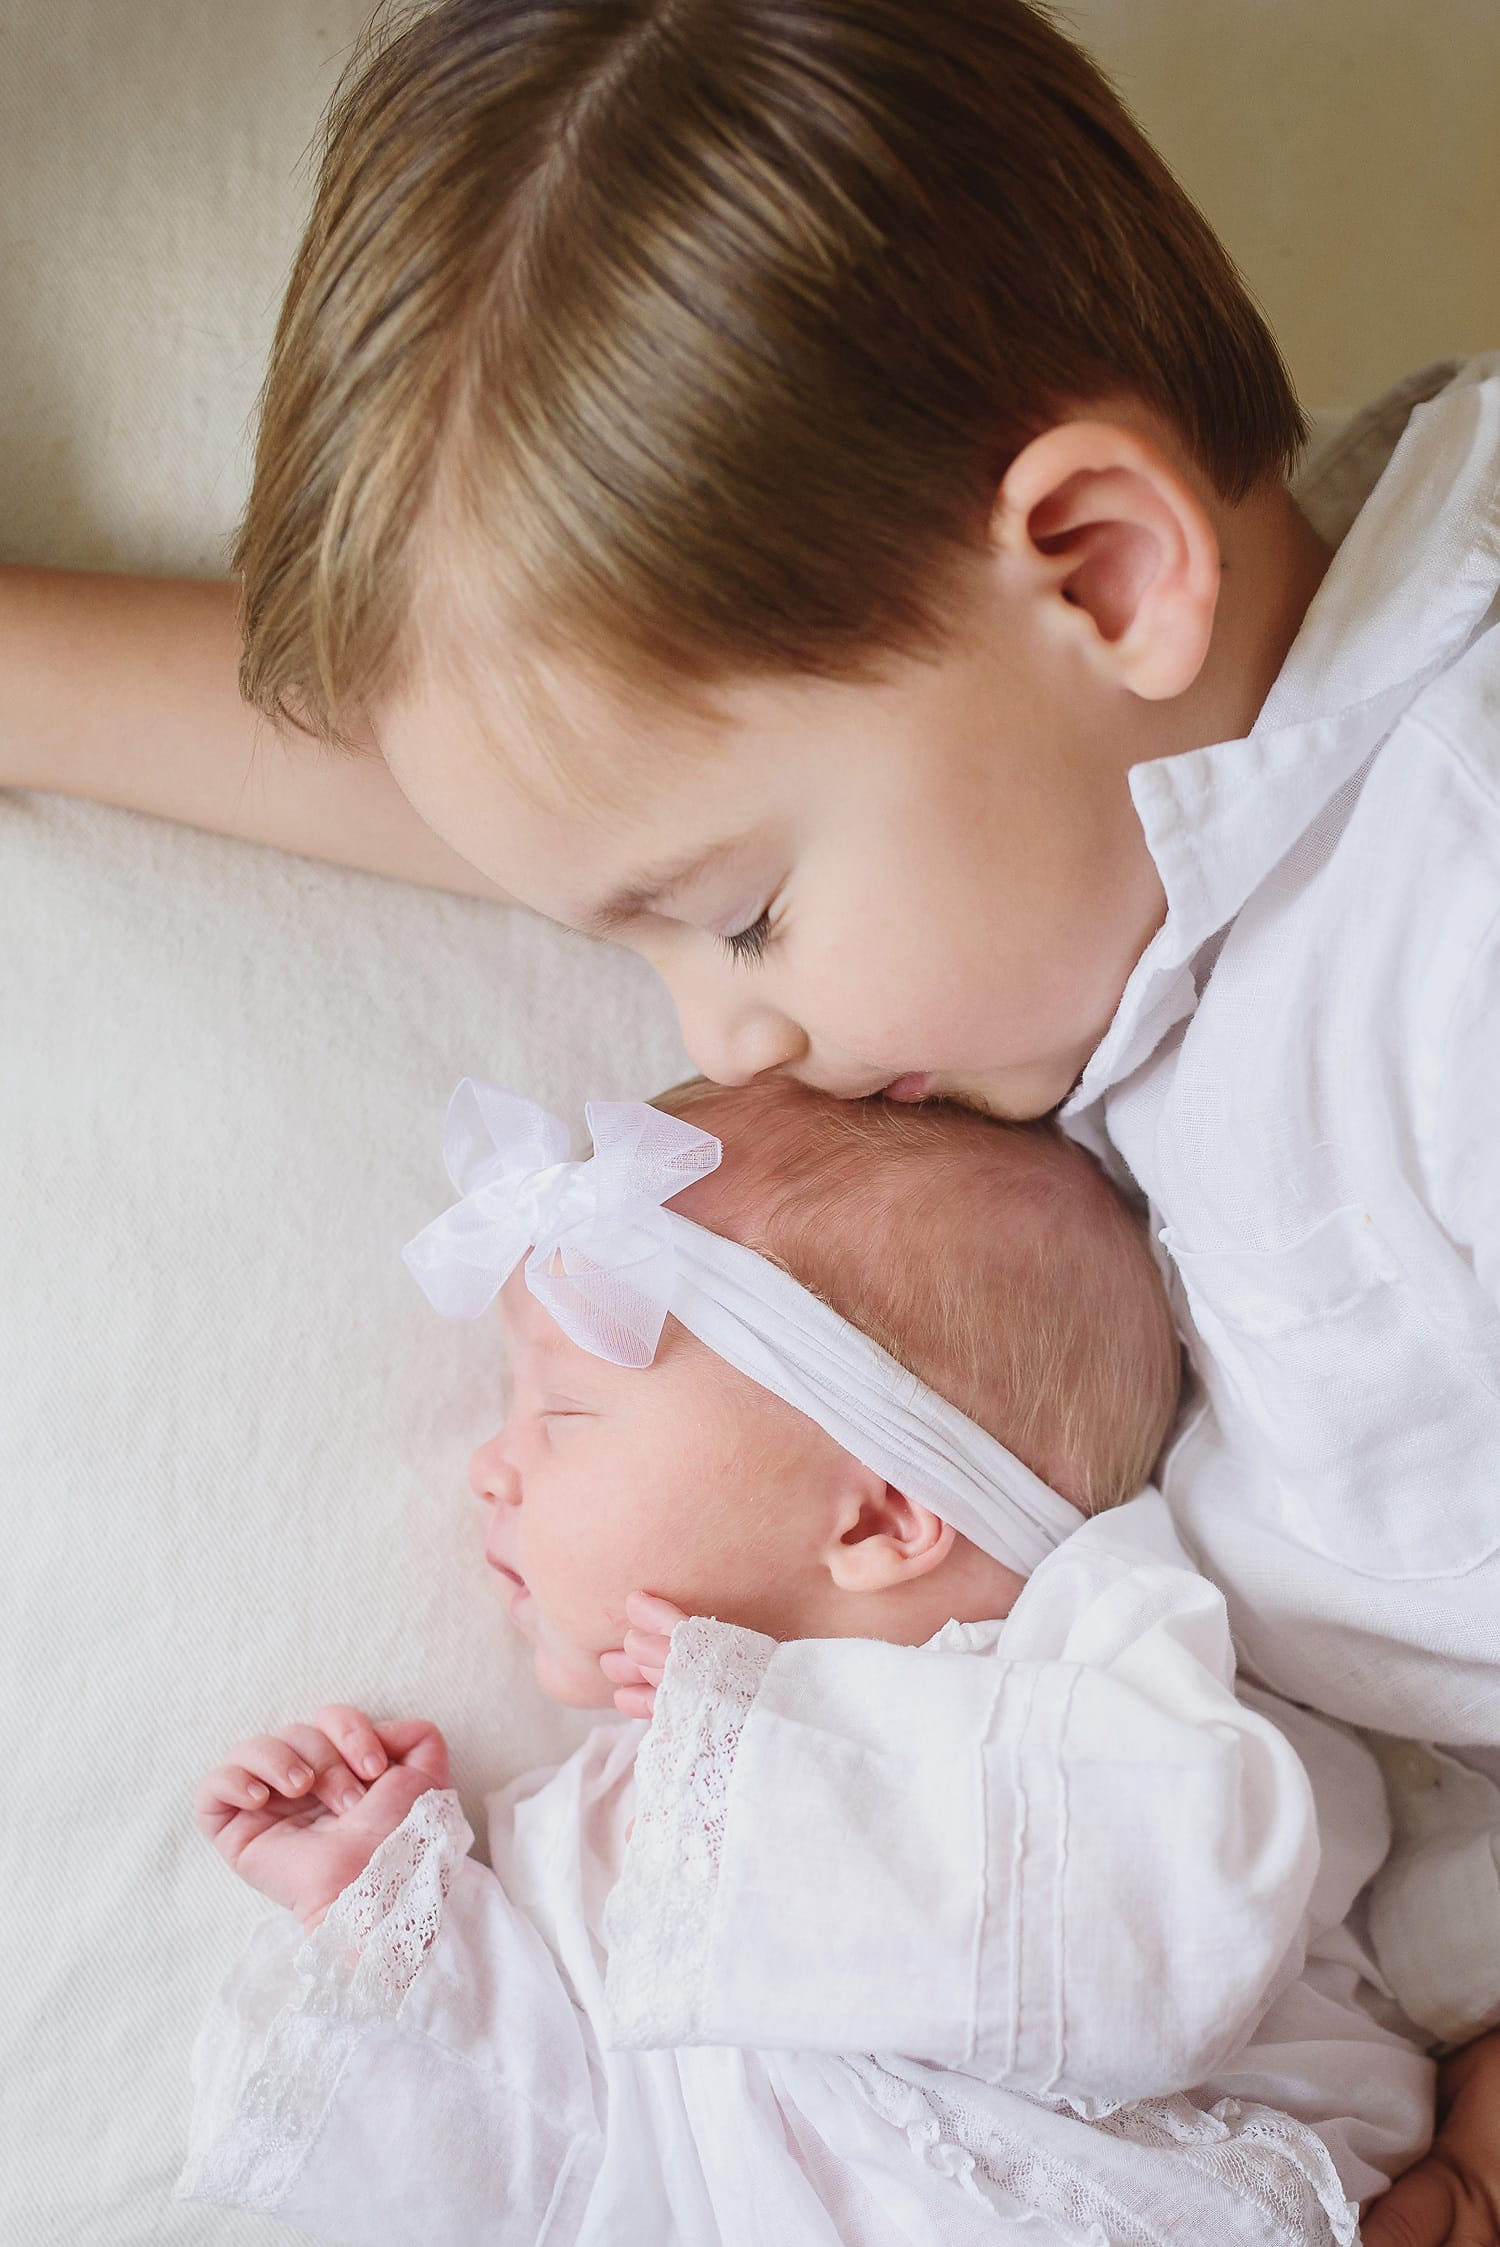 New Orleans Newborn Family Photographer | Linen Jolie